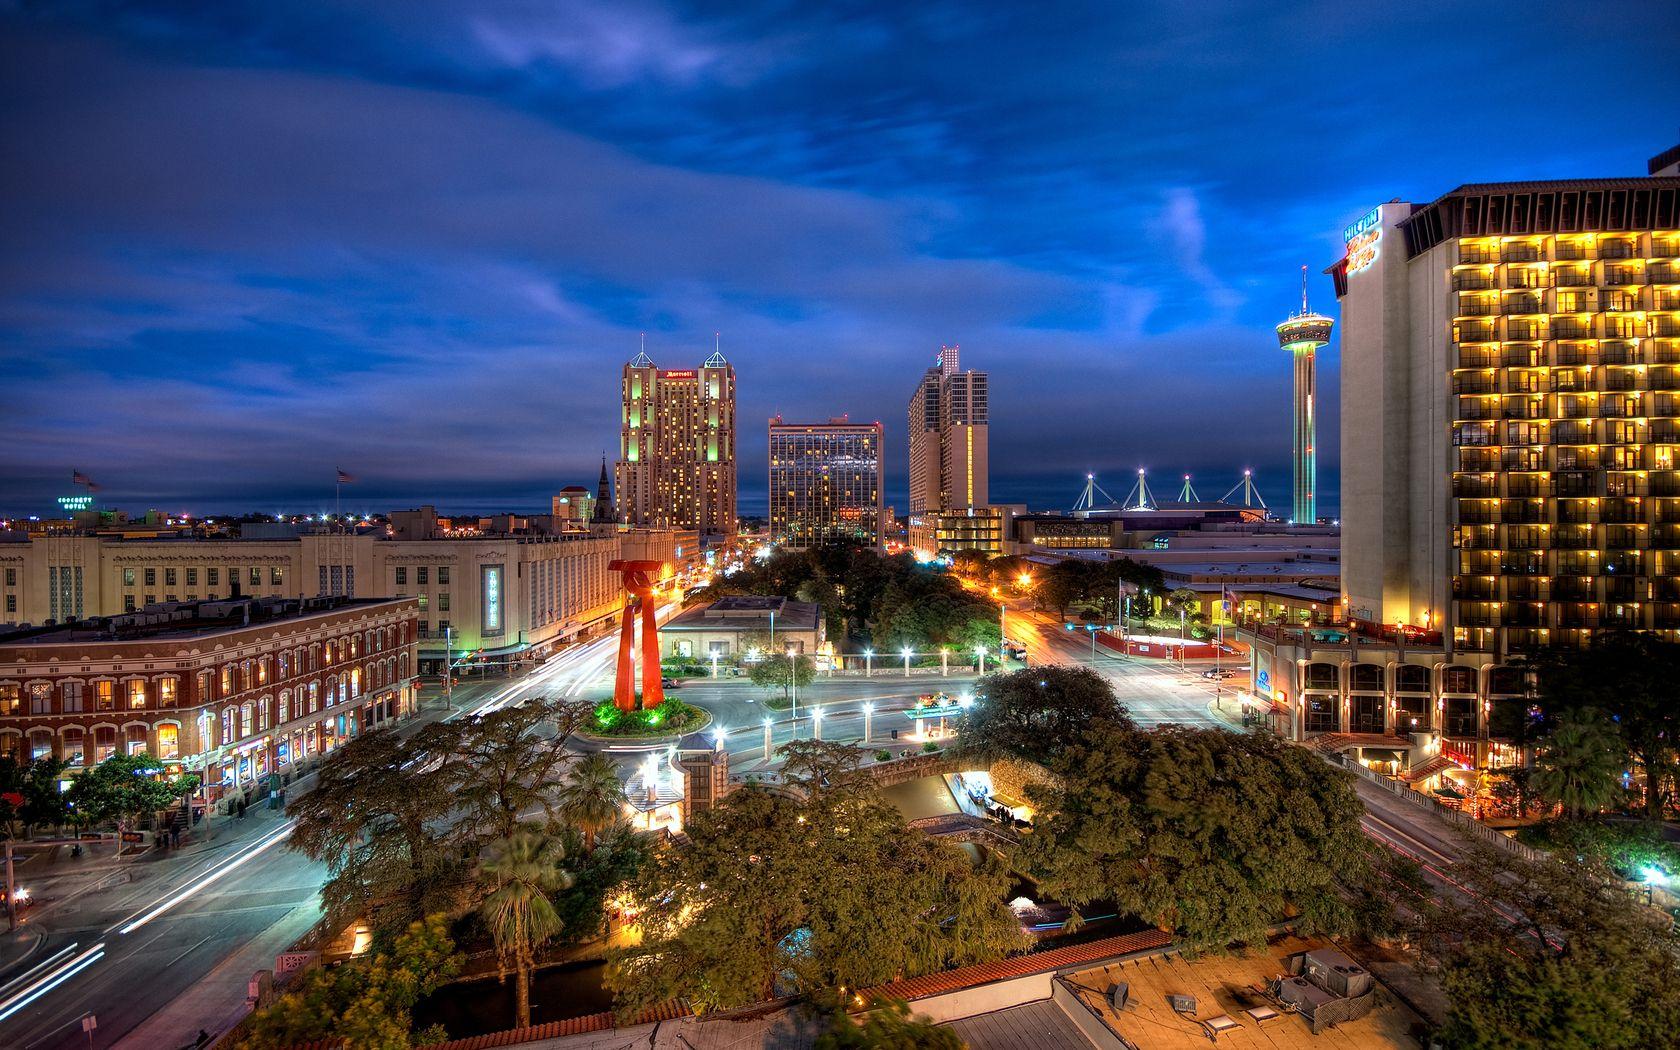 Image detail for Download wallpaper San Antonio, Texas